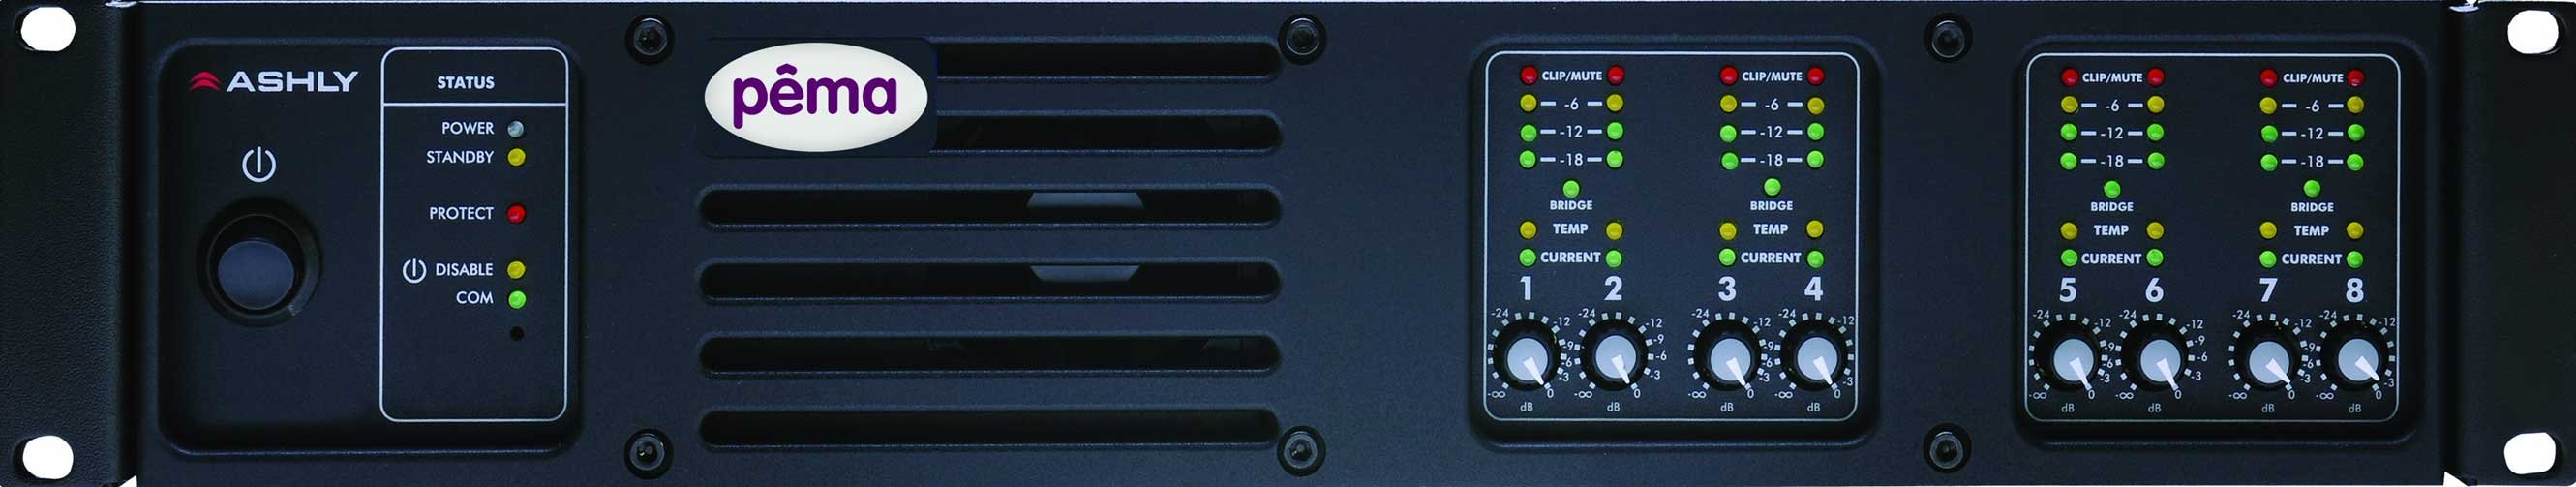 Ashly PEMA8250 Power Amplifier, 8x250W @ 4 Ohm, w/8x8 DSP Matrix PEMA8250